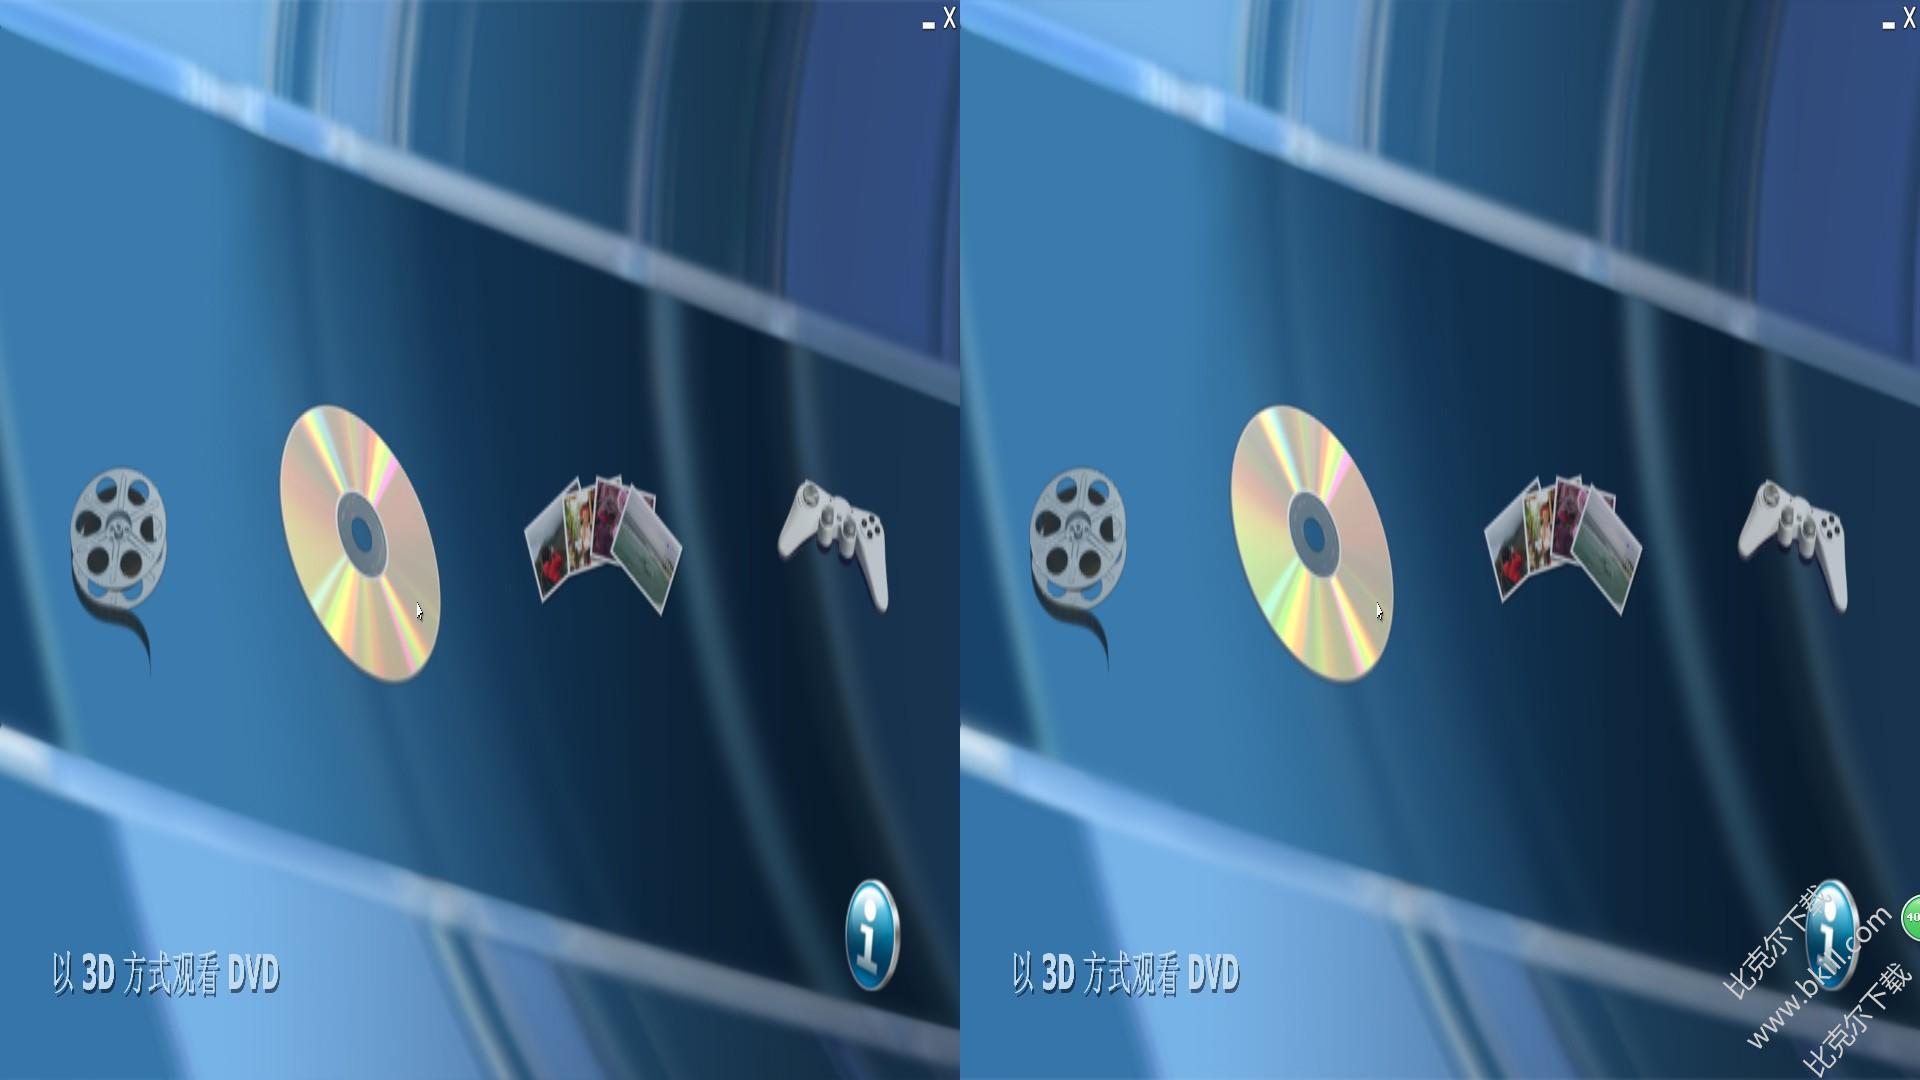 TriDef 3D软件